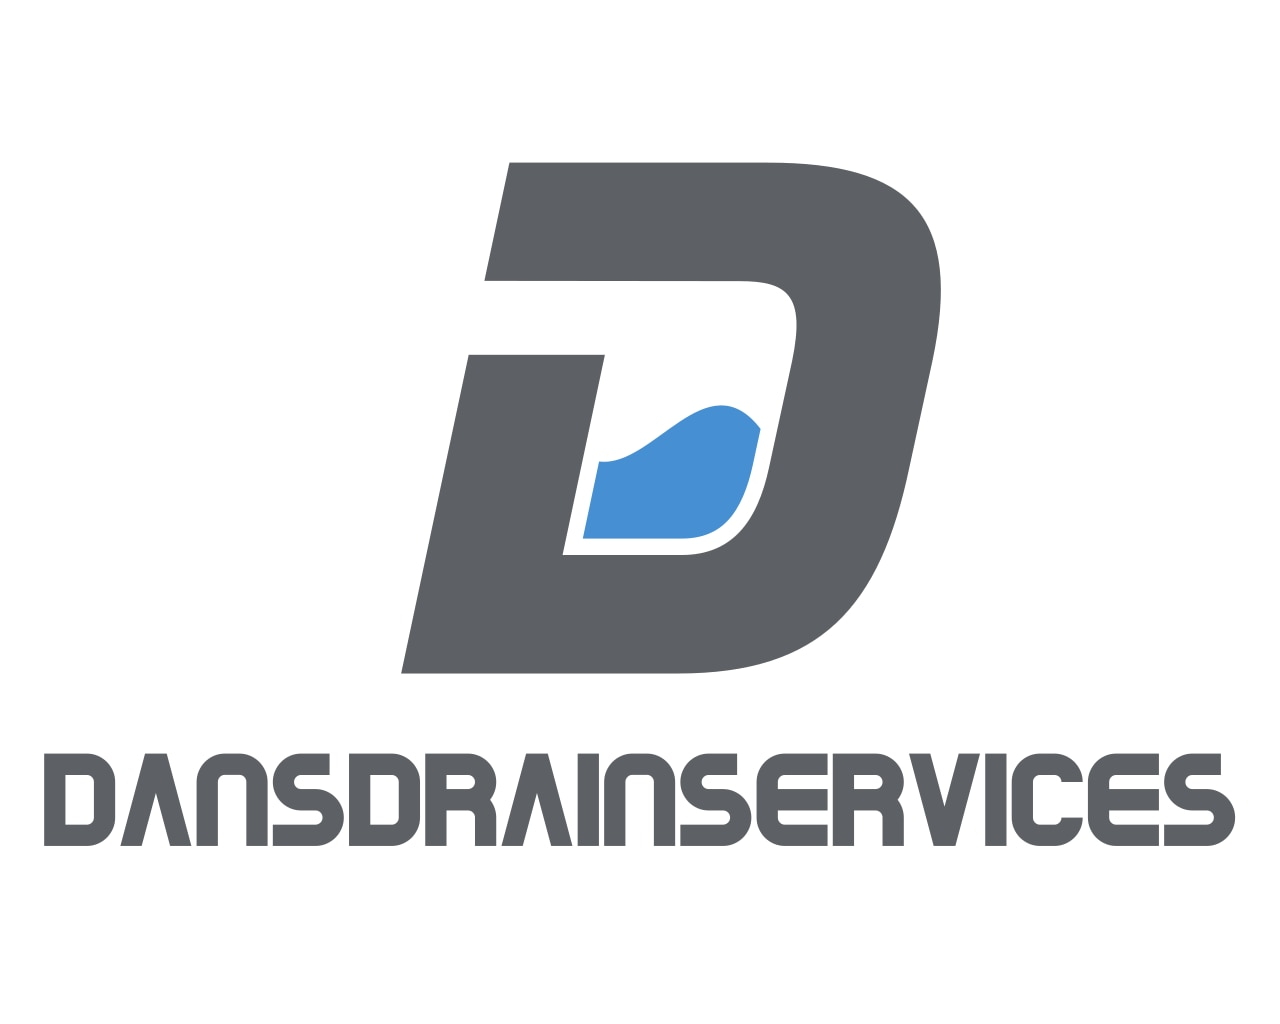 Dan's Drain Services logo